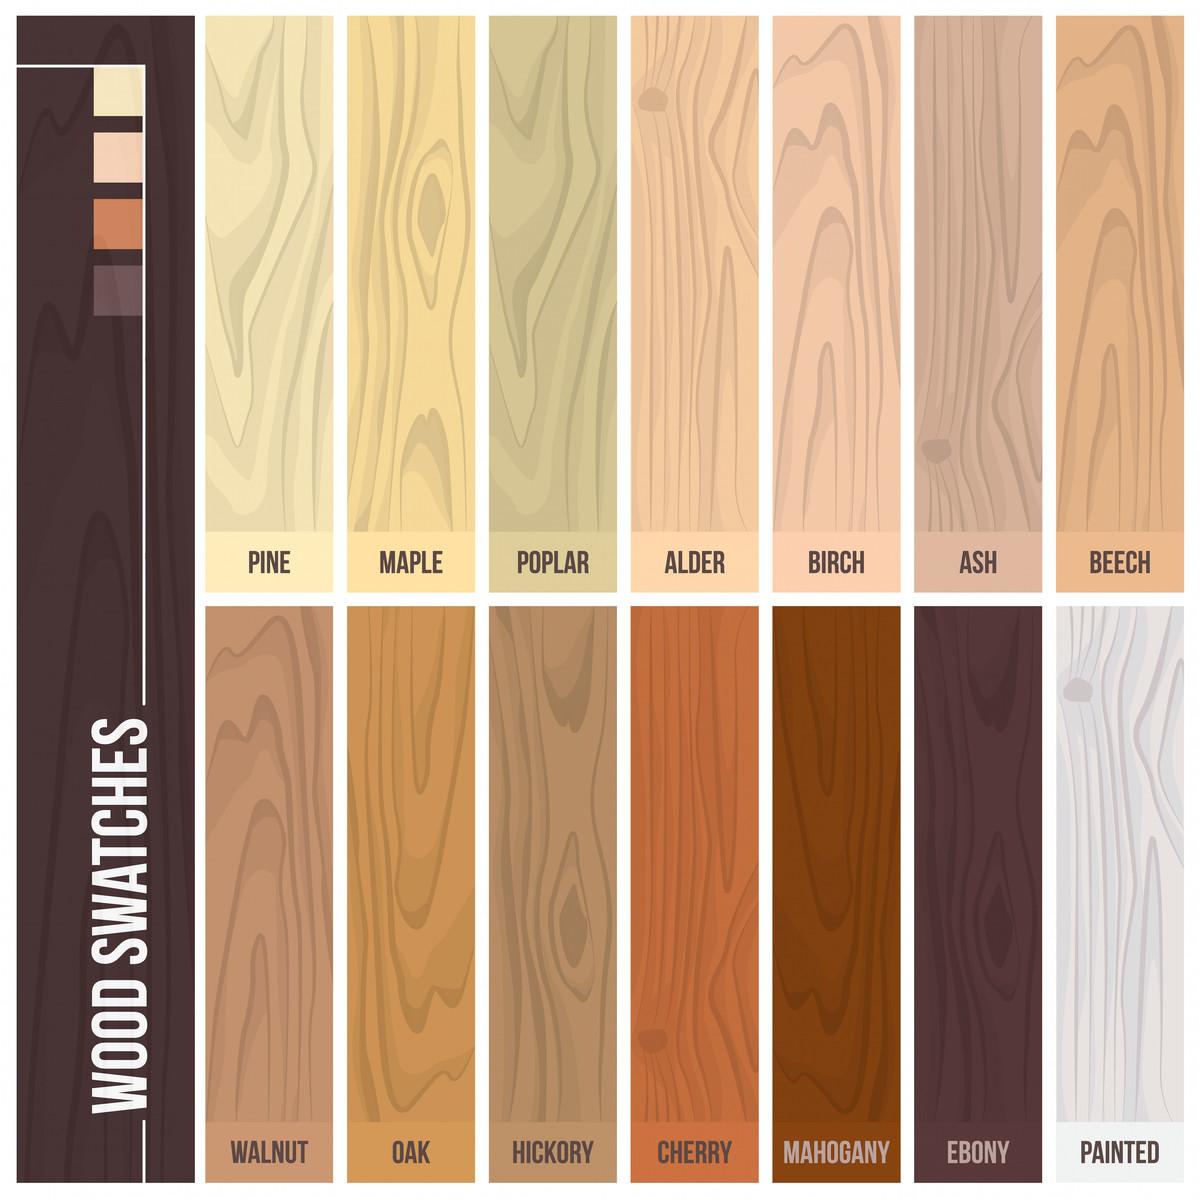 Bamboo Vs Hardwood Flooring Durability Of 12 Types Of Hardwood Flooring Species Styles Edging Dimensions Pertaining to Types Of Hardwood Flooring Illustrated Guide